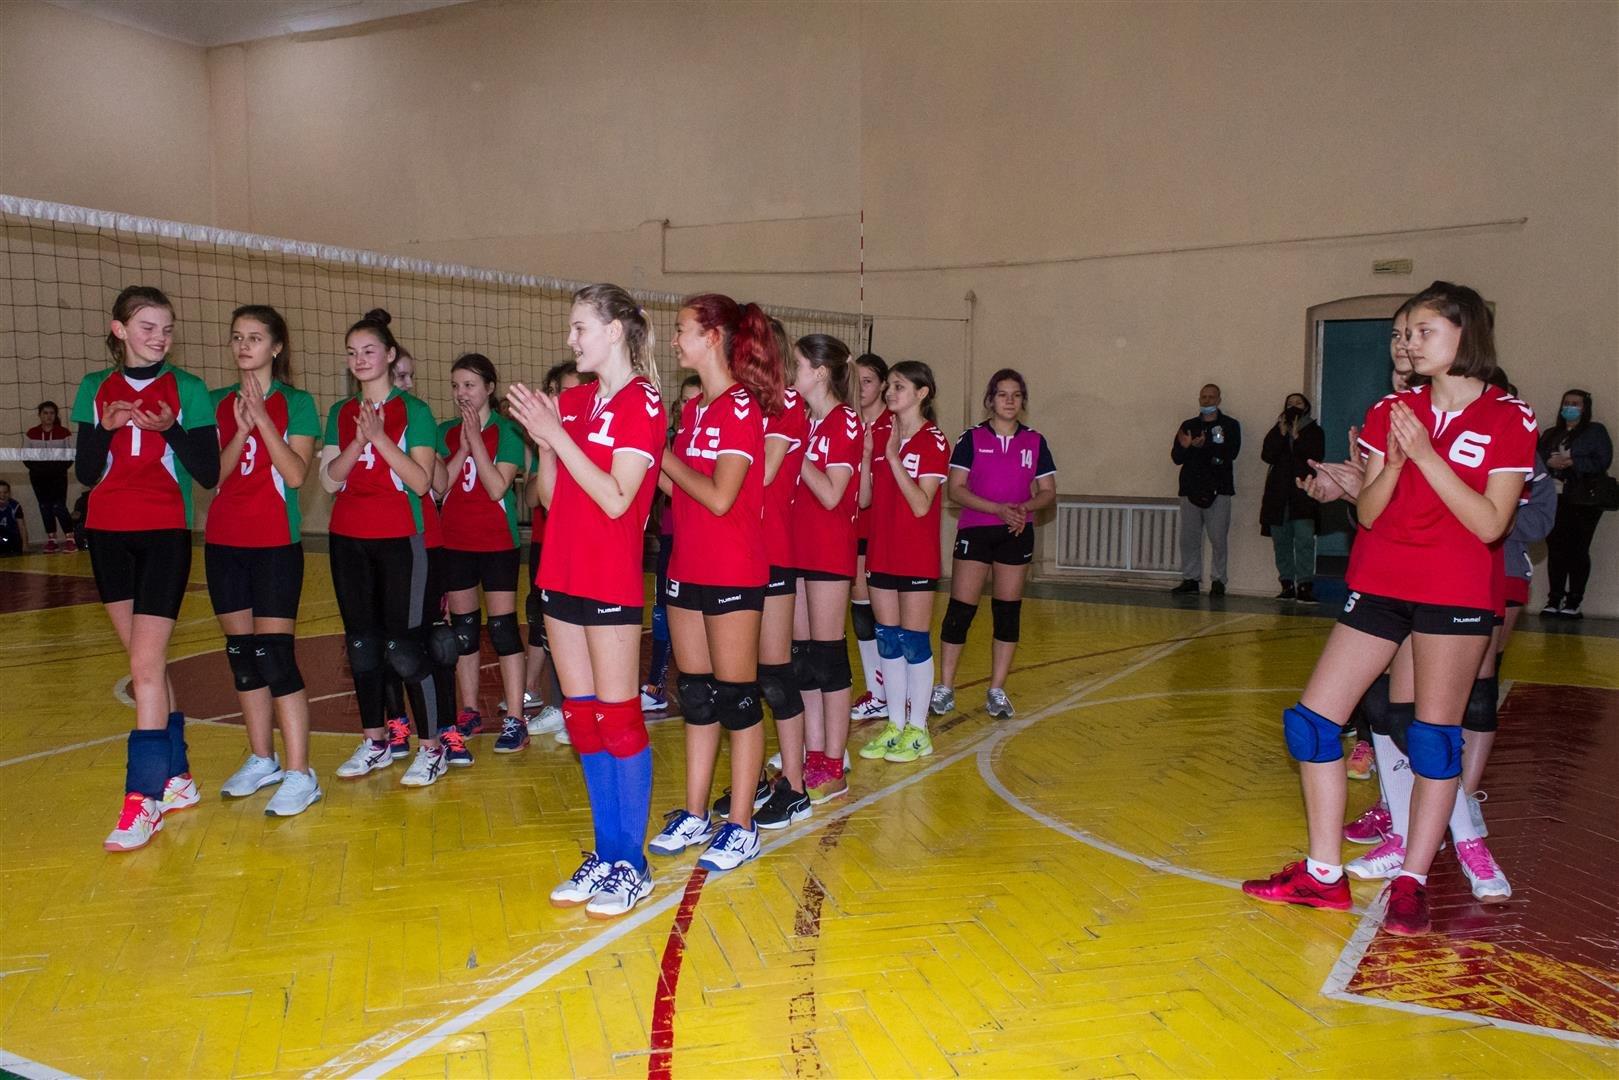 10-14.03.2021 Litvak Volleyball Memorial - Girls